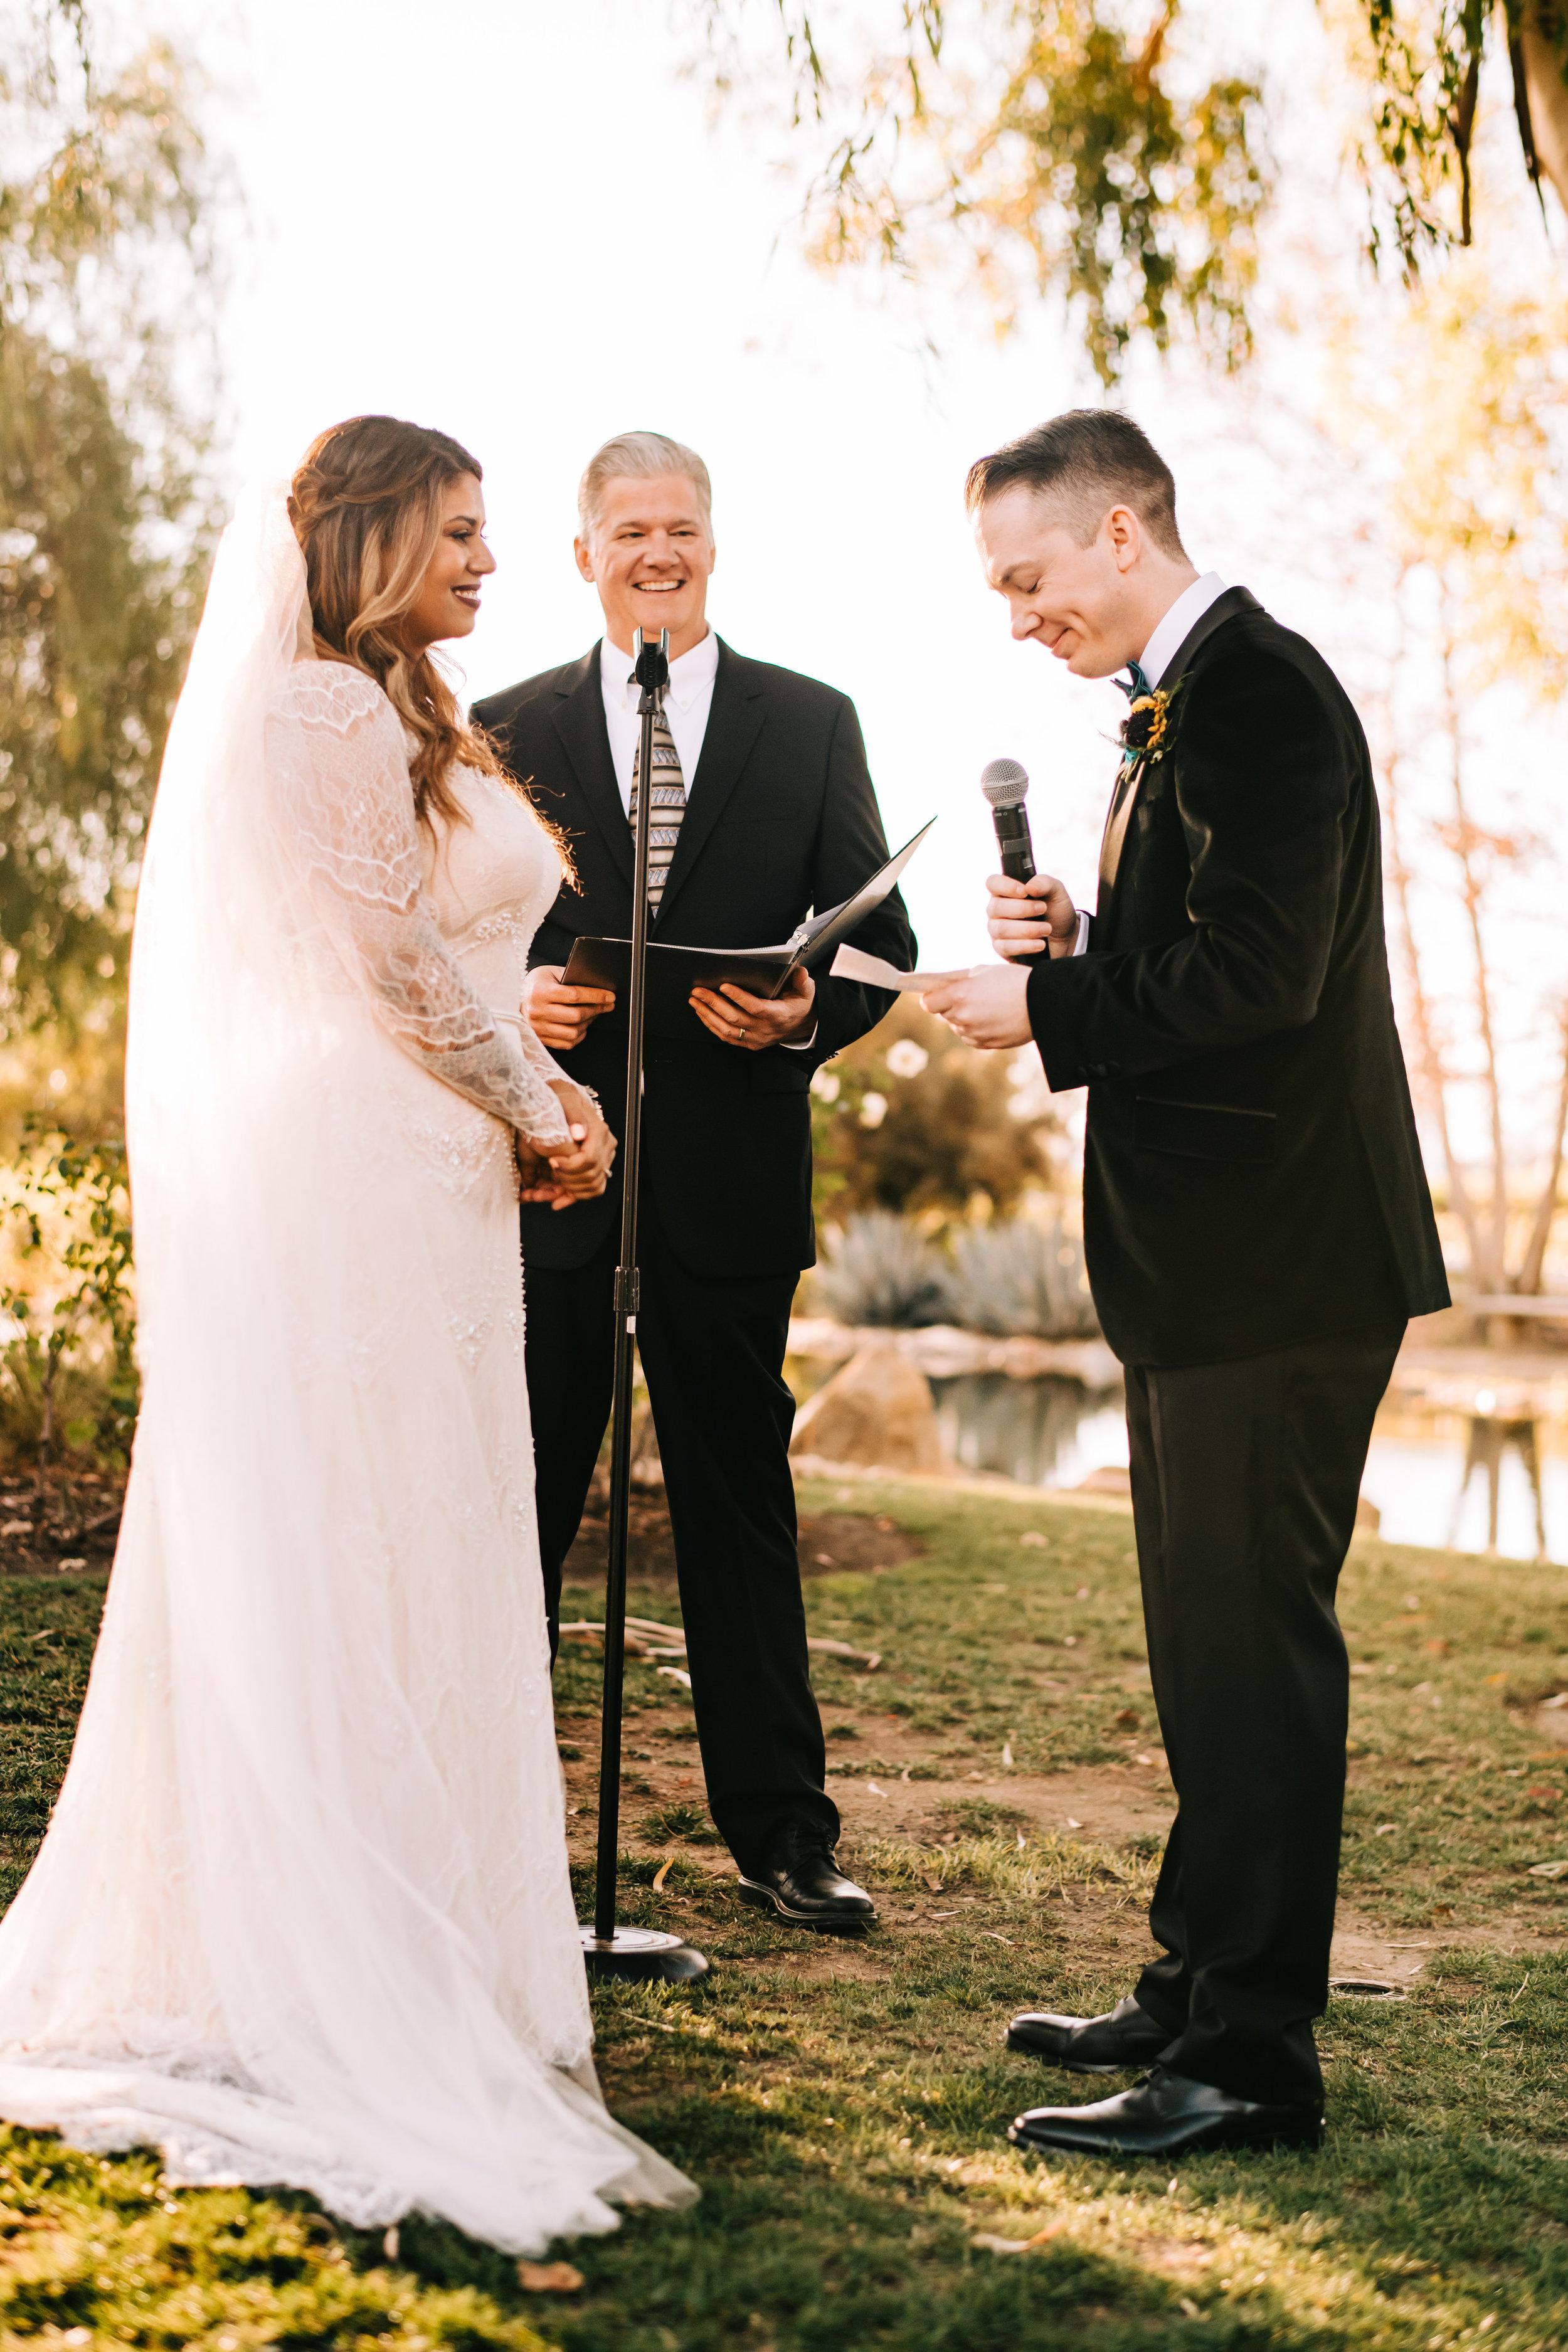 bay area nontraditional wedding photographer southern california boho wedding love light magic san francisco oakland northern california-537.jpg